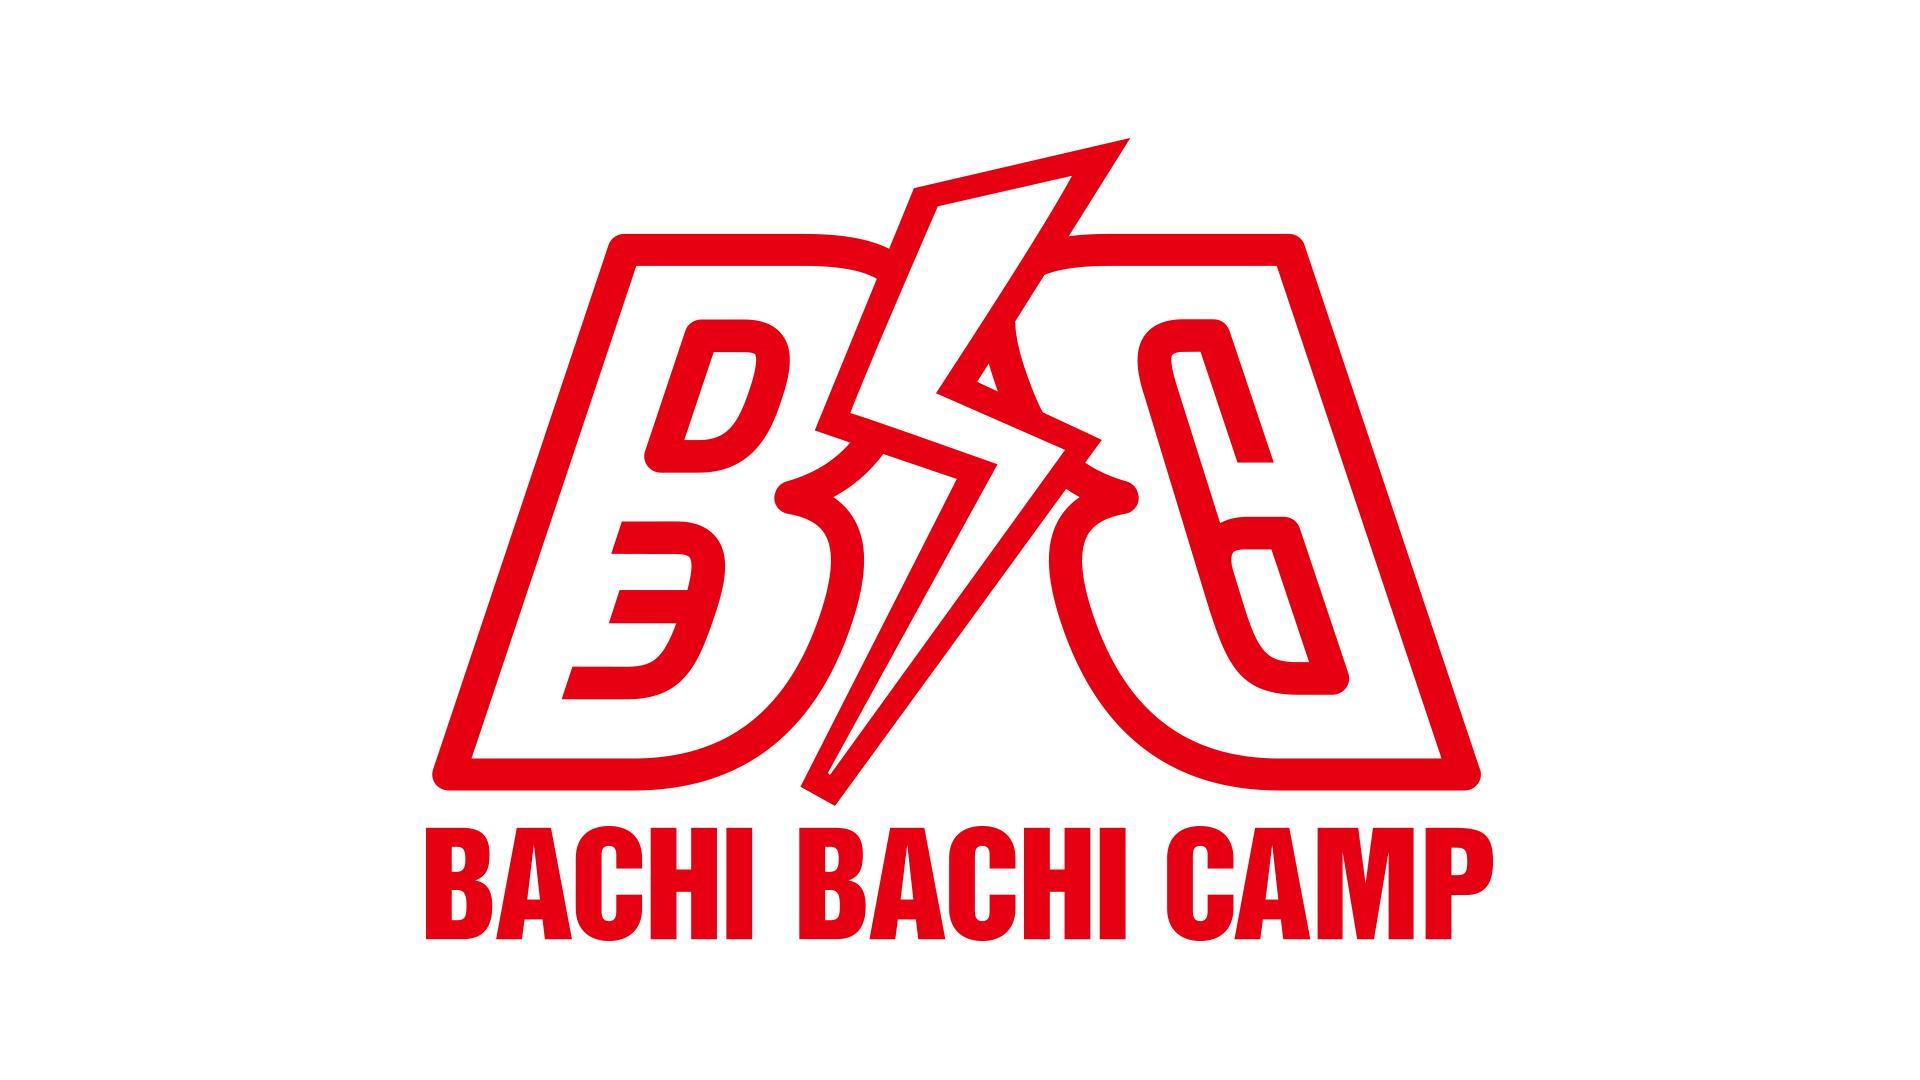 【NMB48】8/18 12:30から新YNNで「BACHI BACHI CAMP」の生配信が決定。